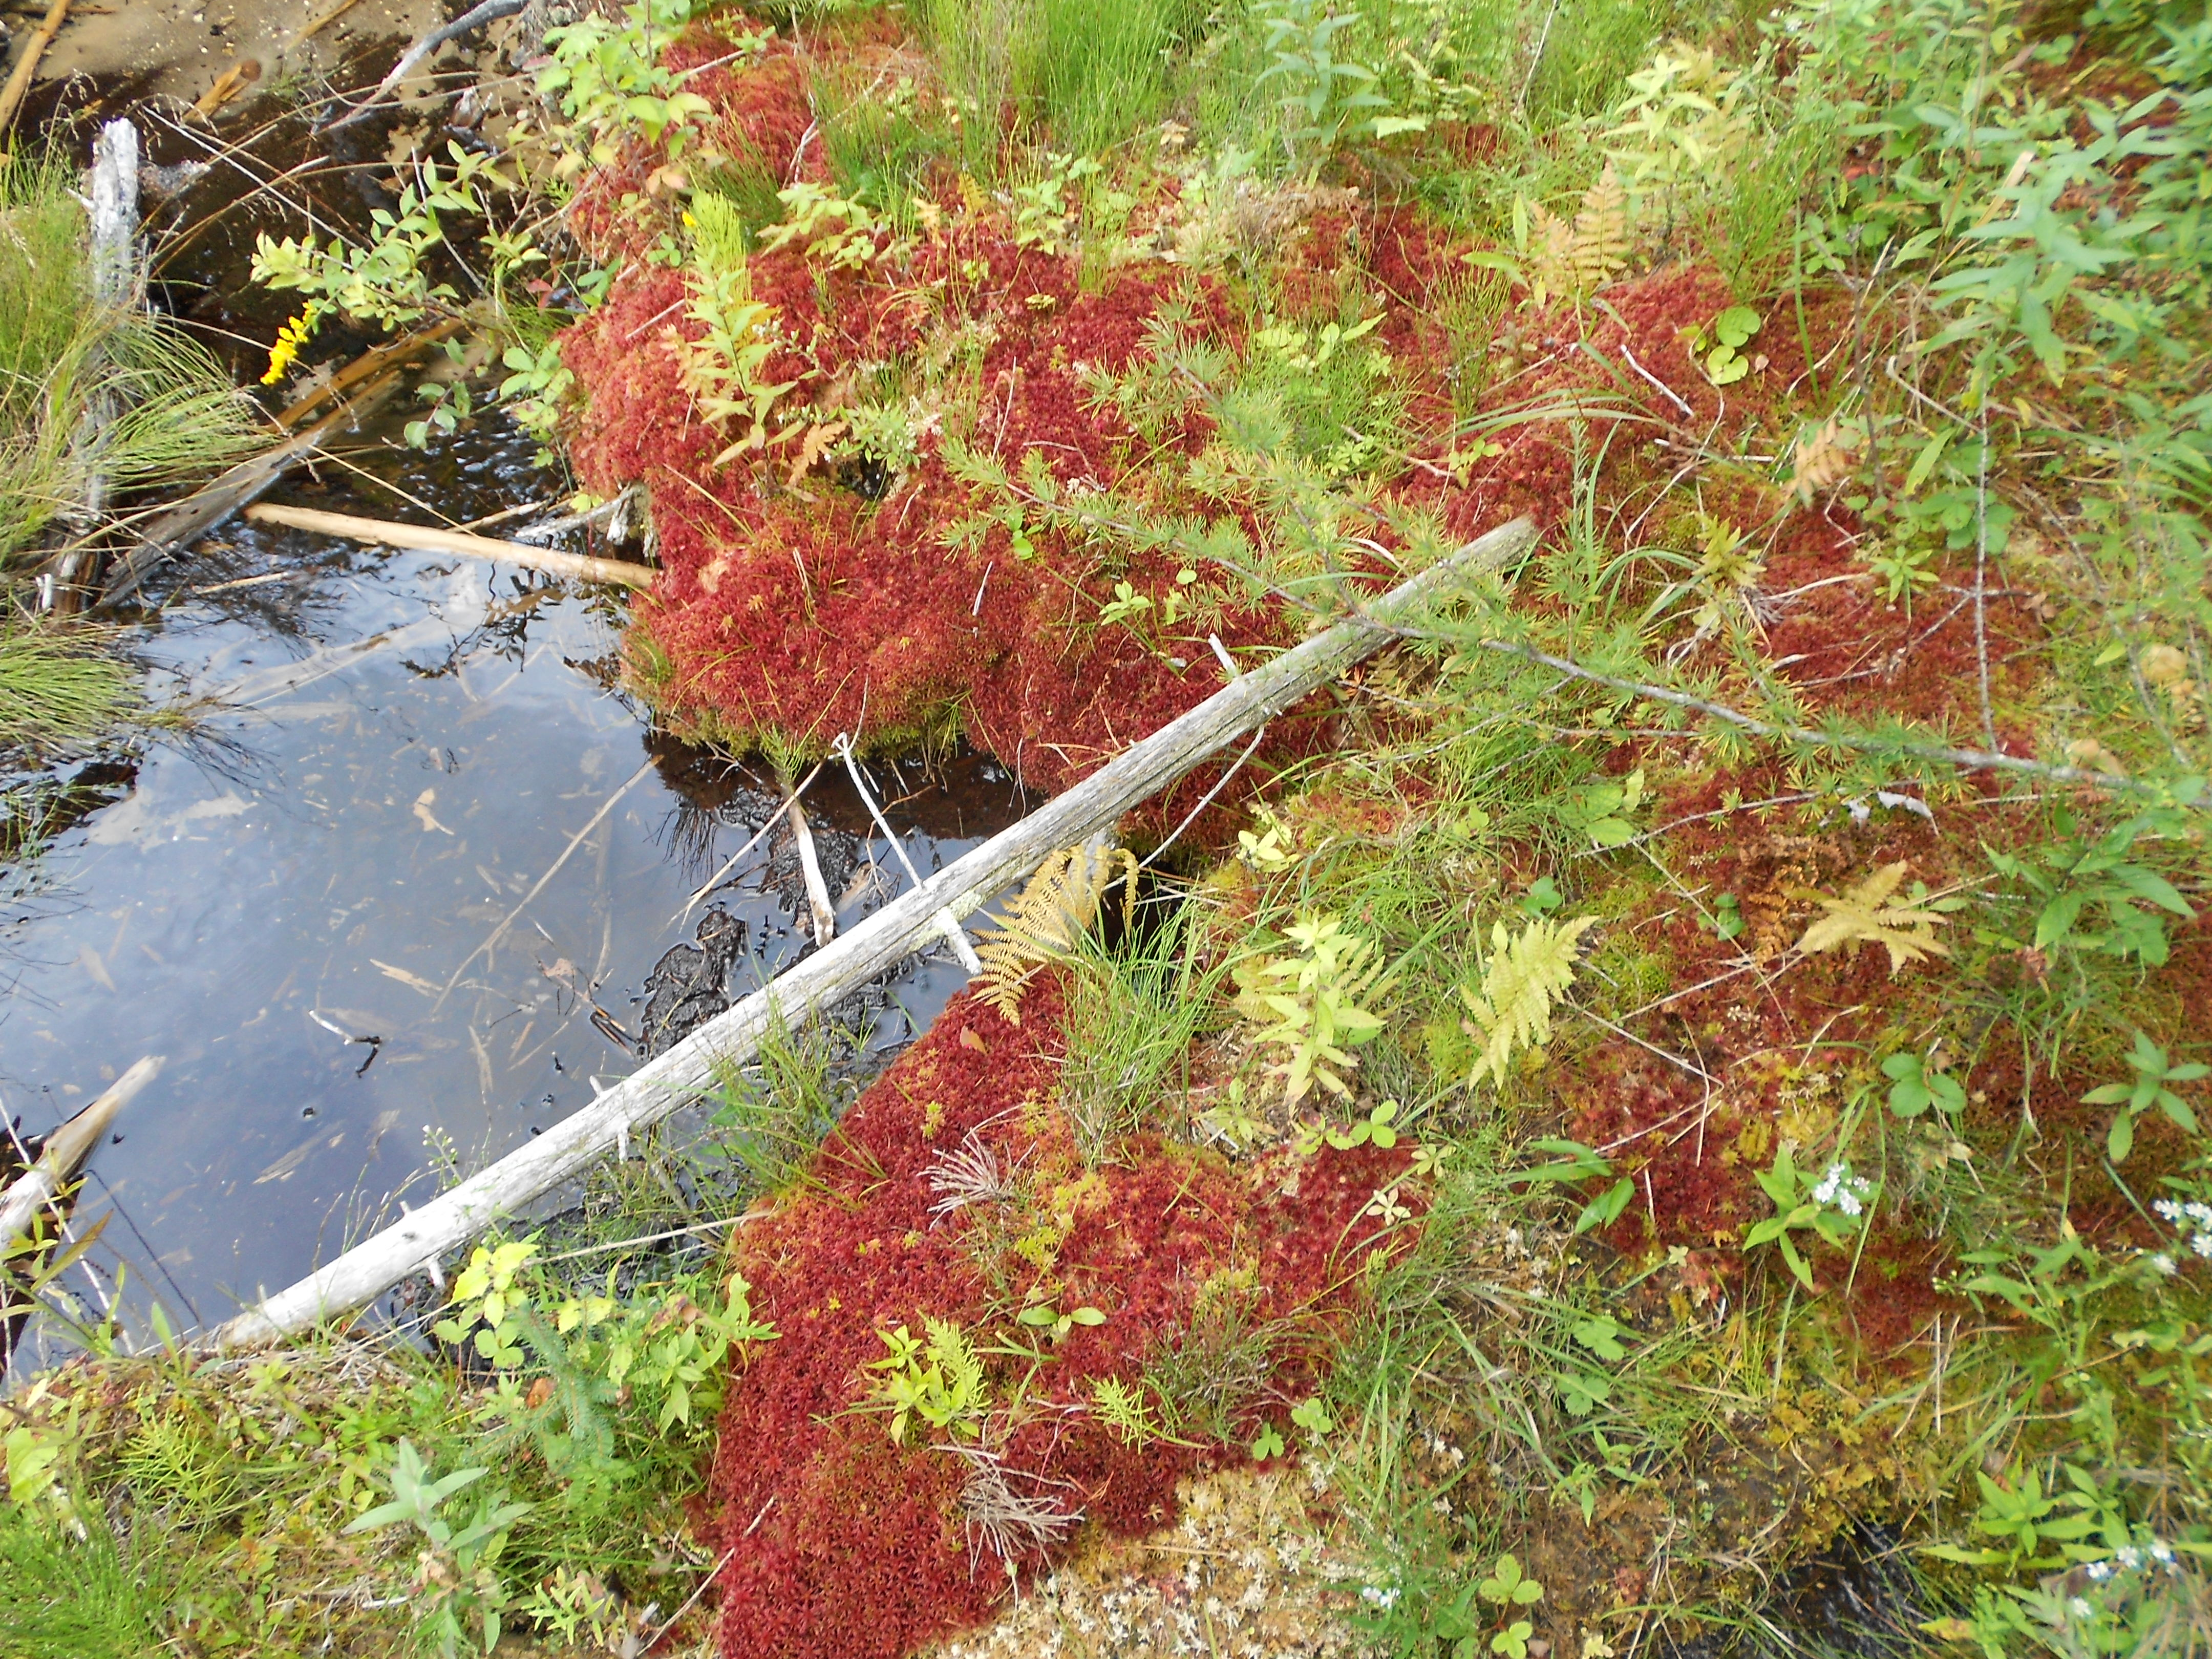 ...red sphagnum moss...